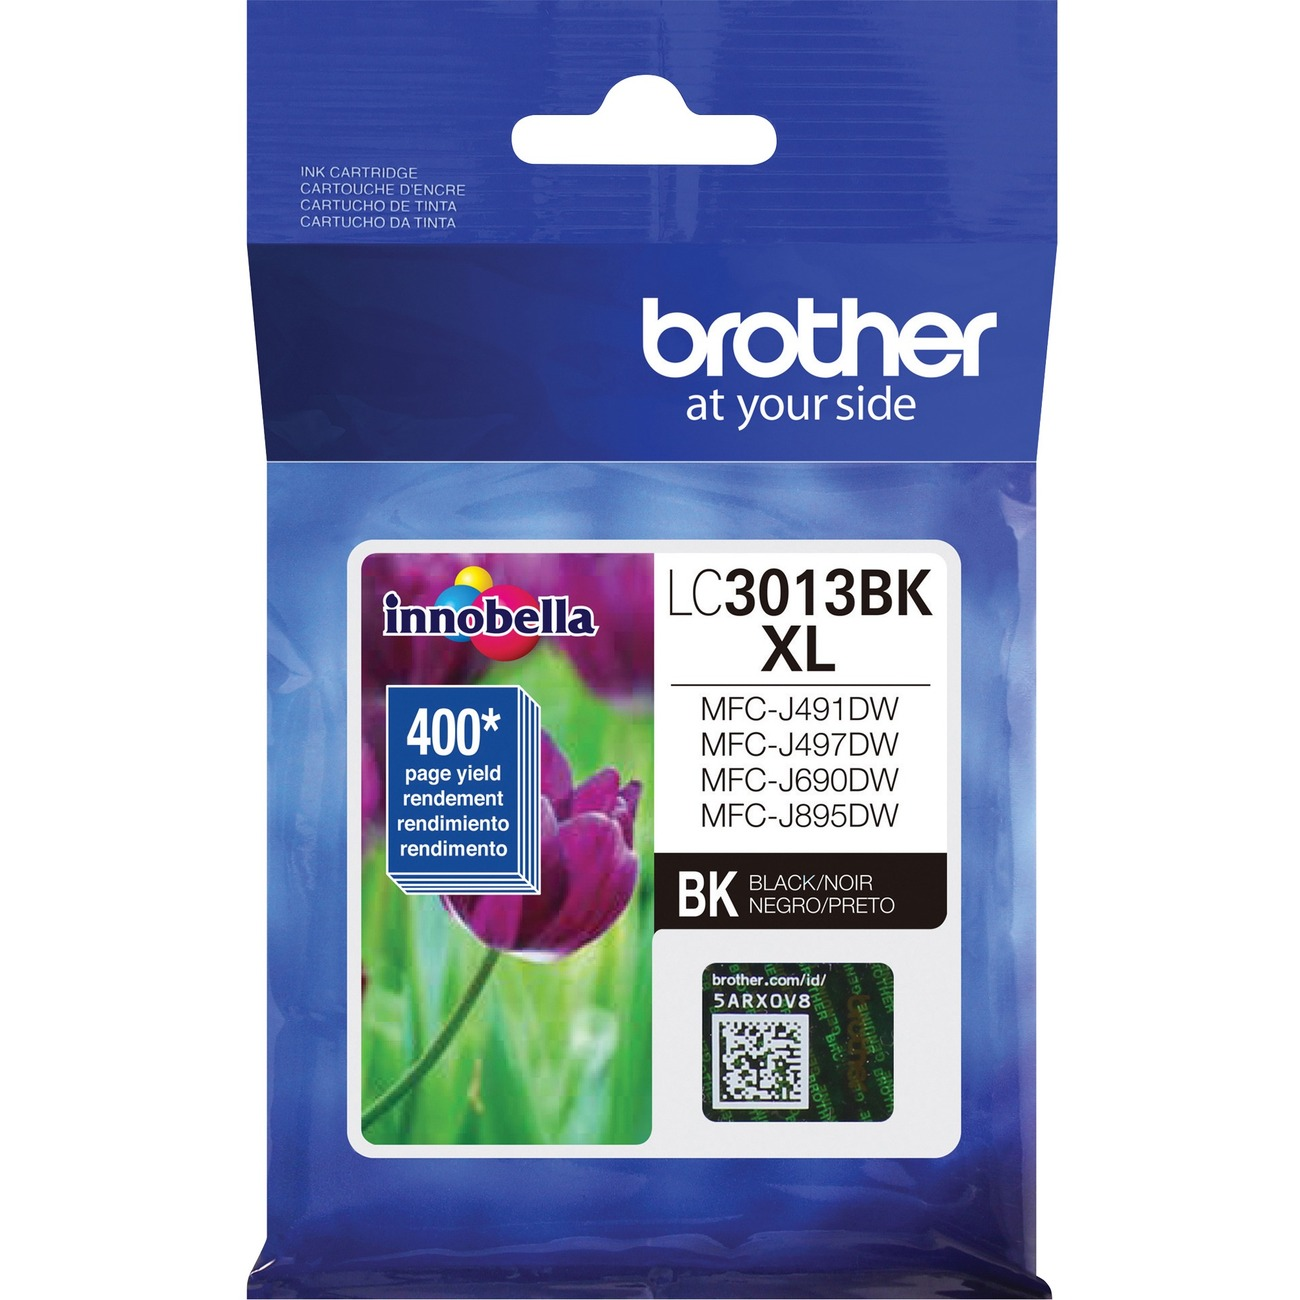 Brother LC3013BK Black Ink Cartridge High Yield 400 Yield